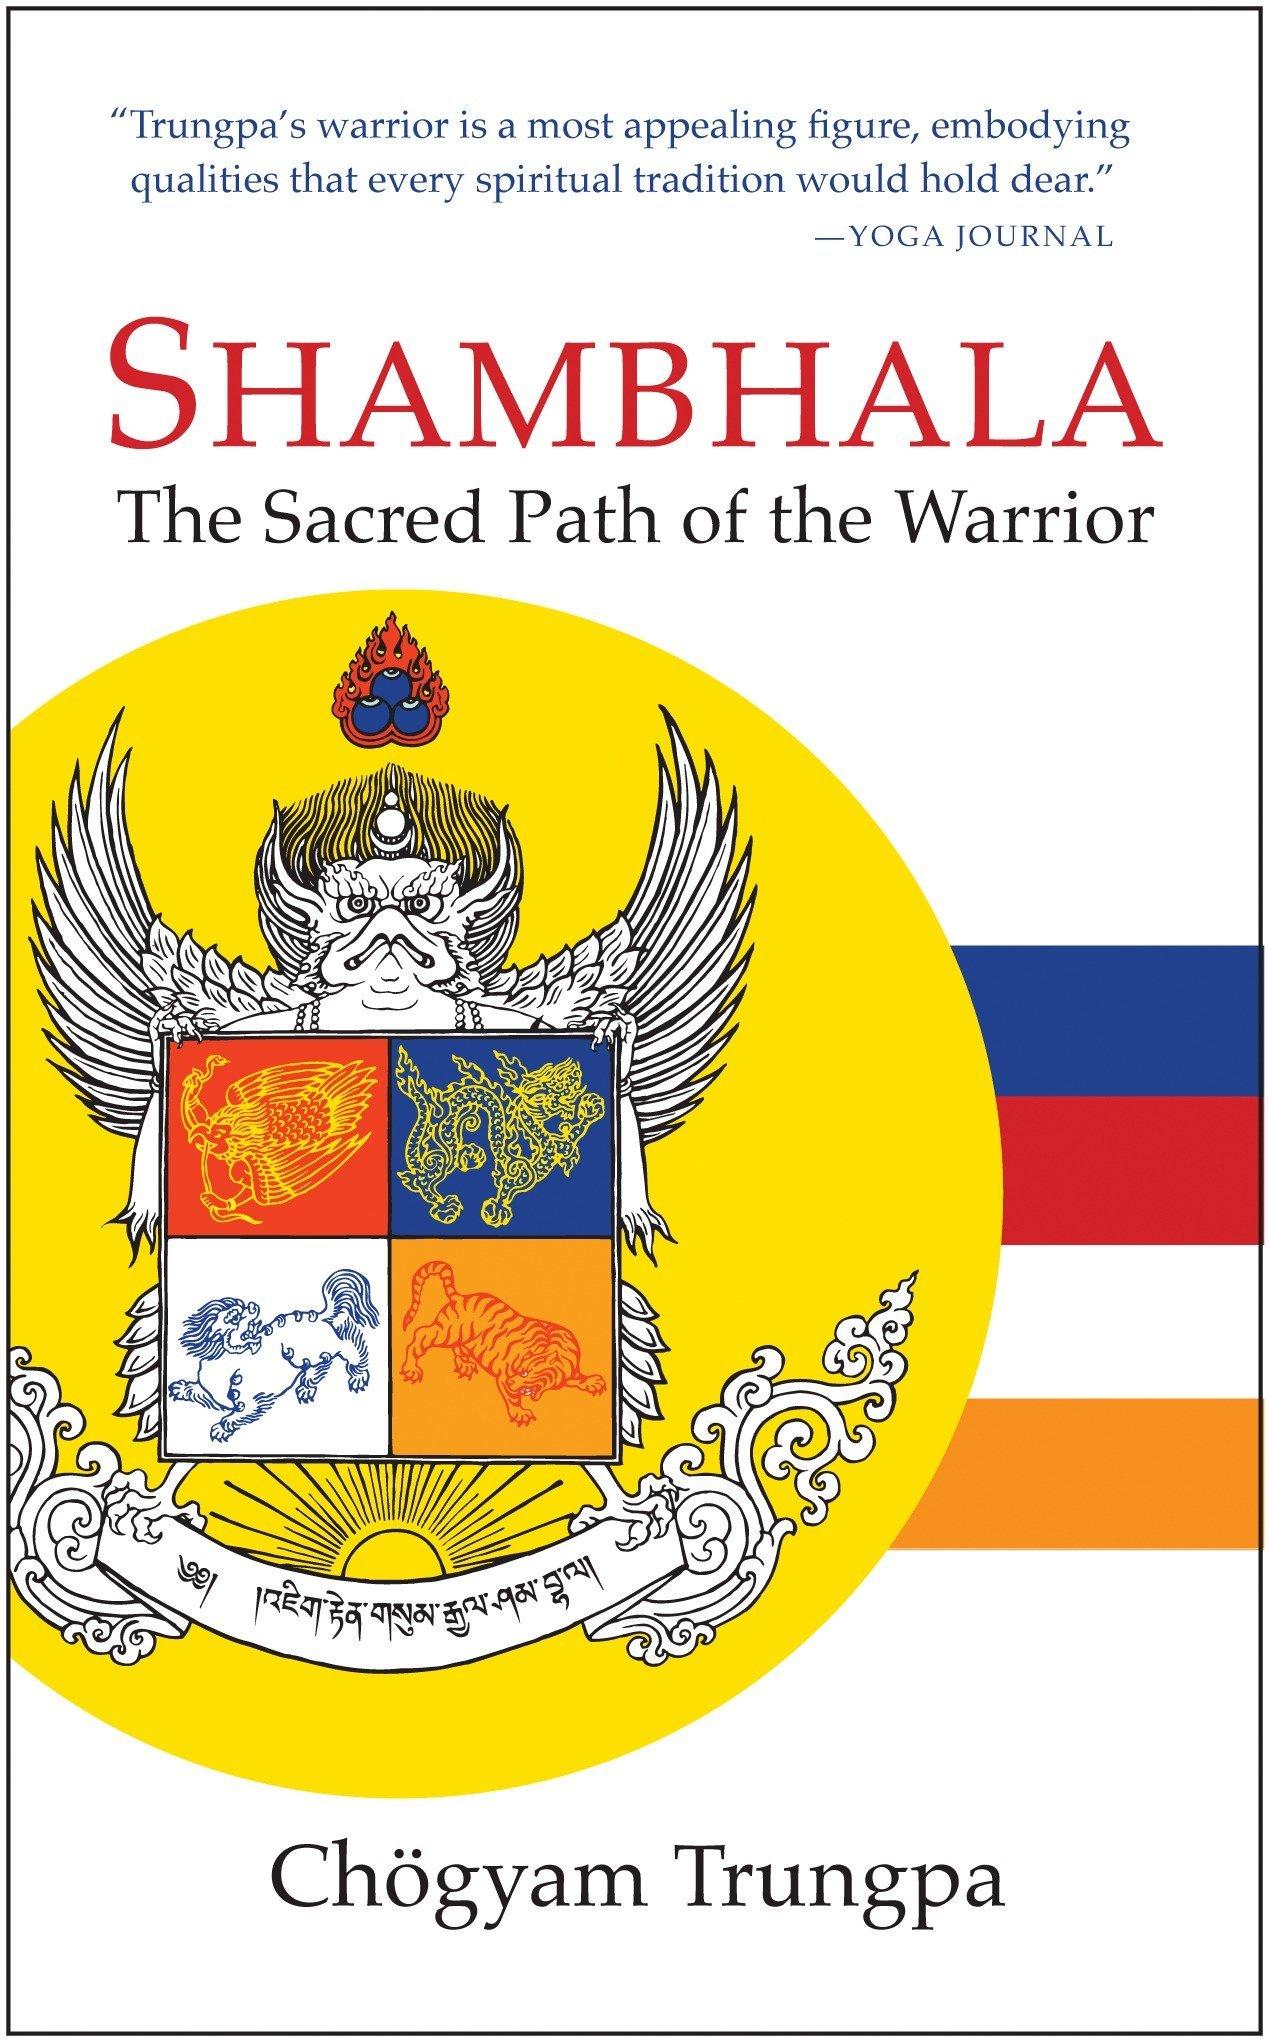 Shambhala The Sacred Path Of The Warrior Chogyam Trungpa Carolyn